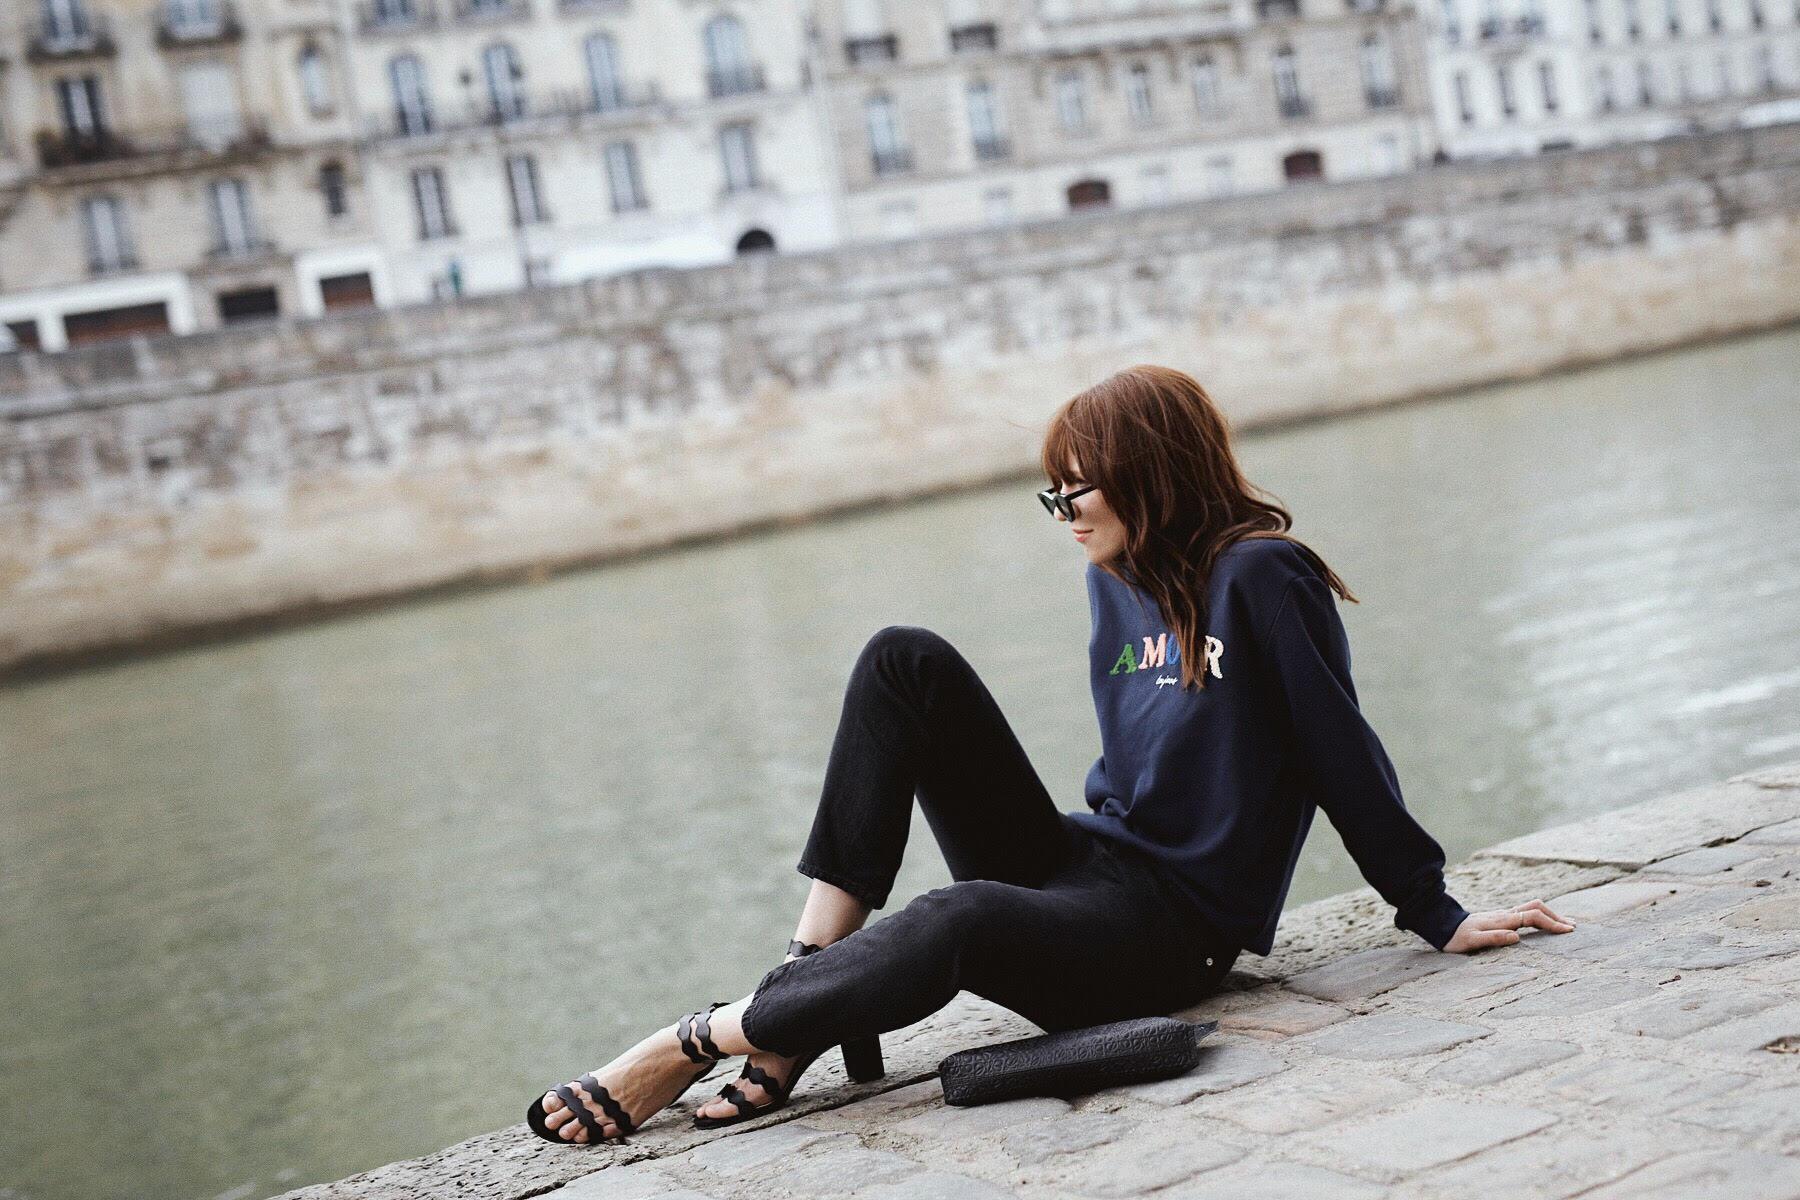 outfit paris other stories paris amour toujours sweater mint&berry sandals rouje jeans lesfillesenrouje catsanddogsblog ricarda schernus max bechmann fotografie film 3